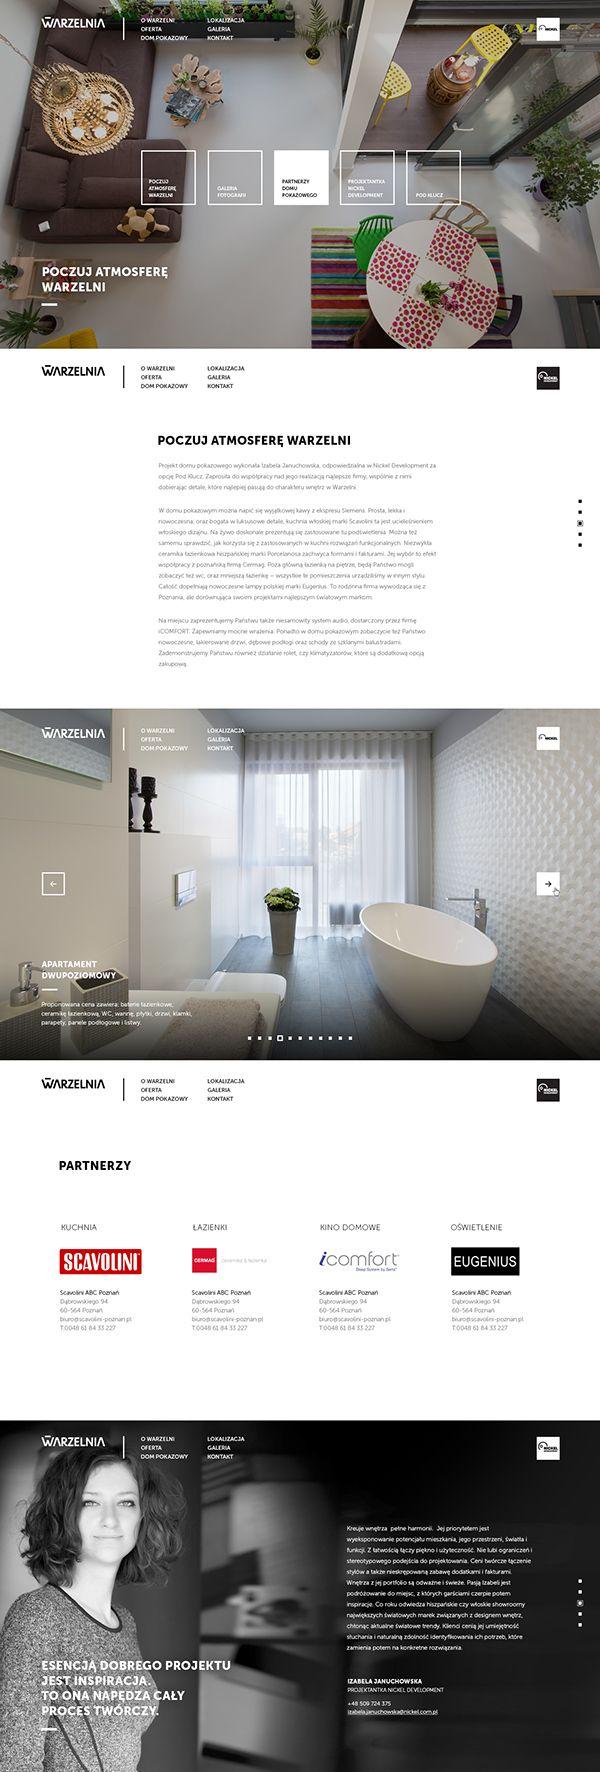 New Warzelnia (redesigned) on Web Design Served